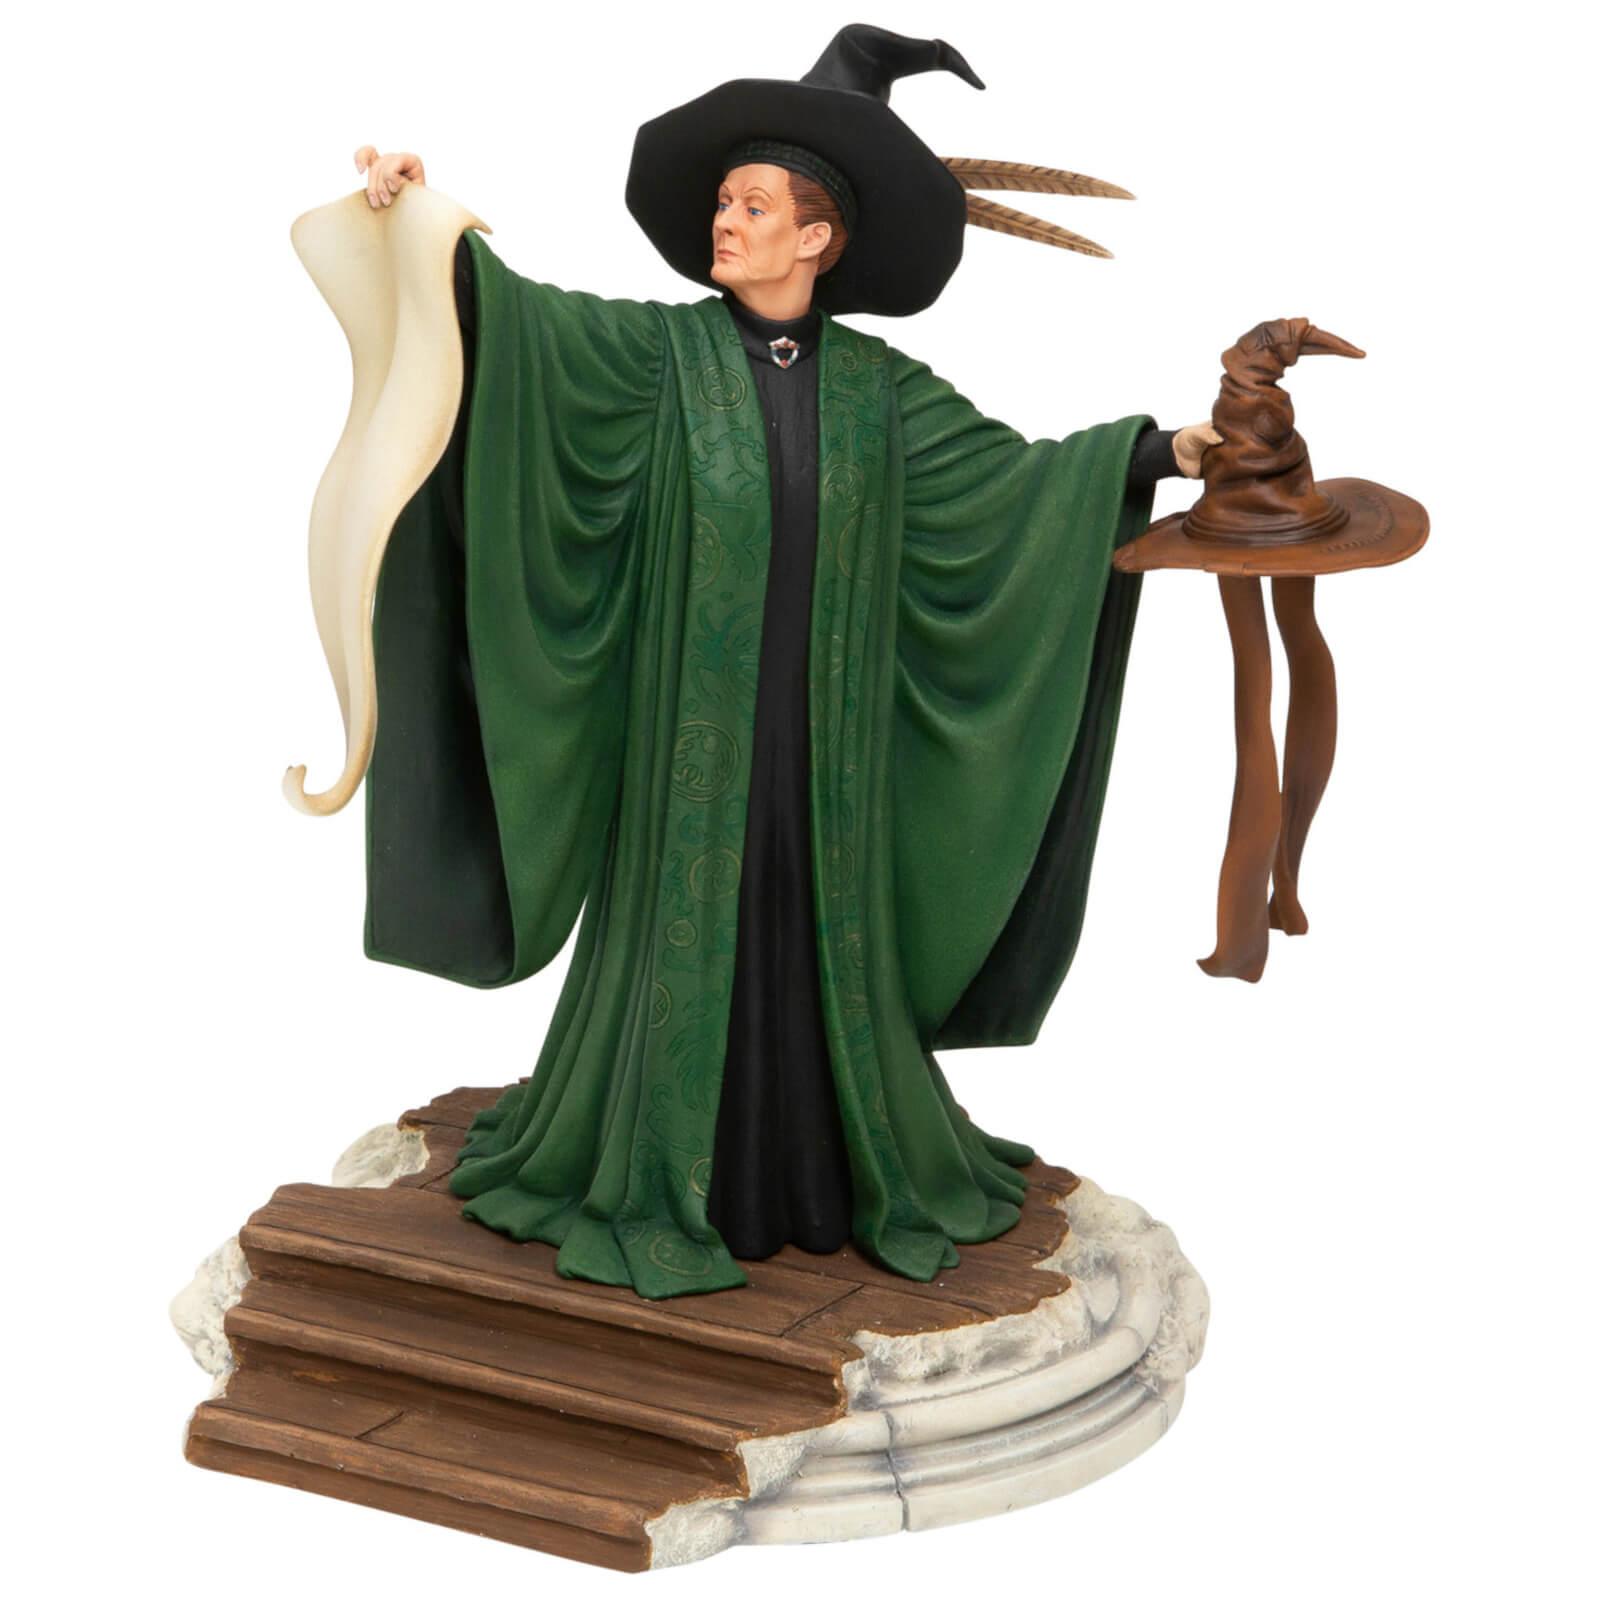 Image of Wizarding World Of Harry Potter Professor Mcgonagall Year One Figurine